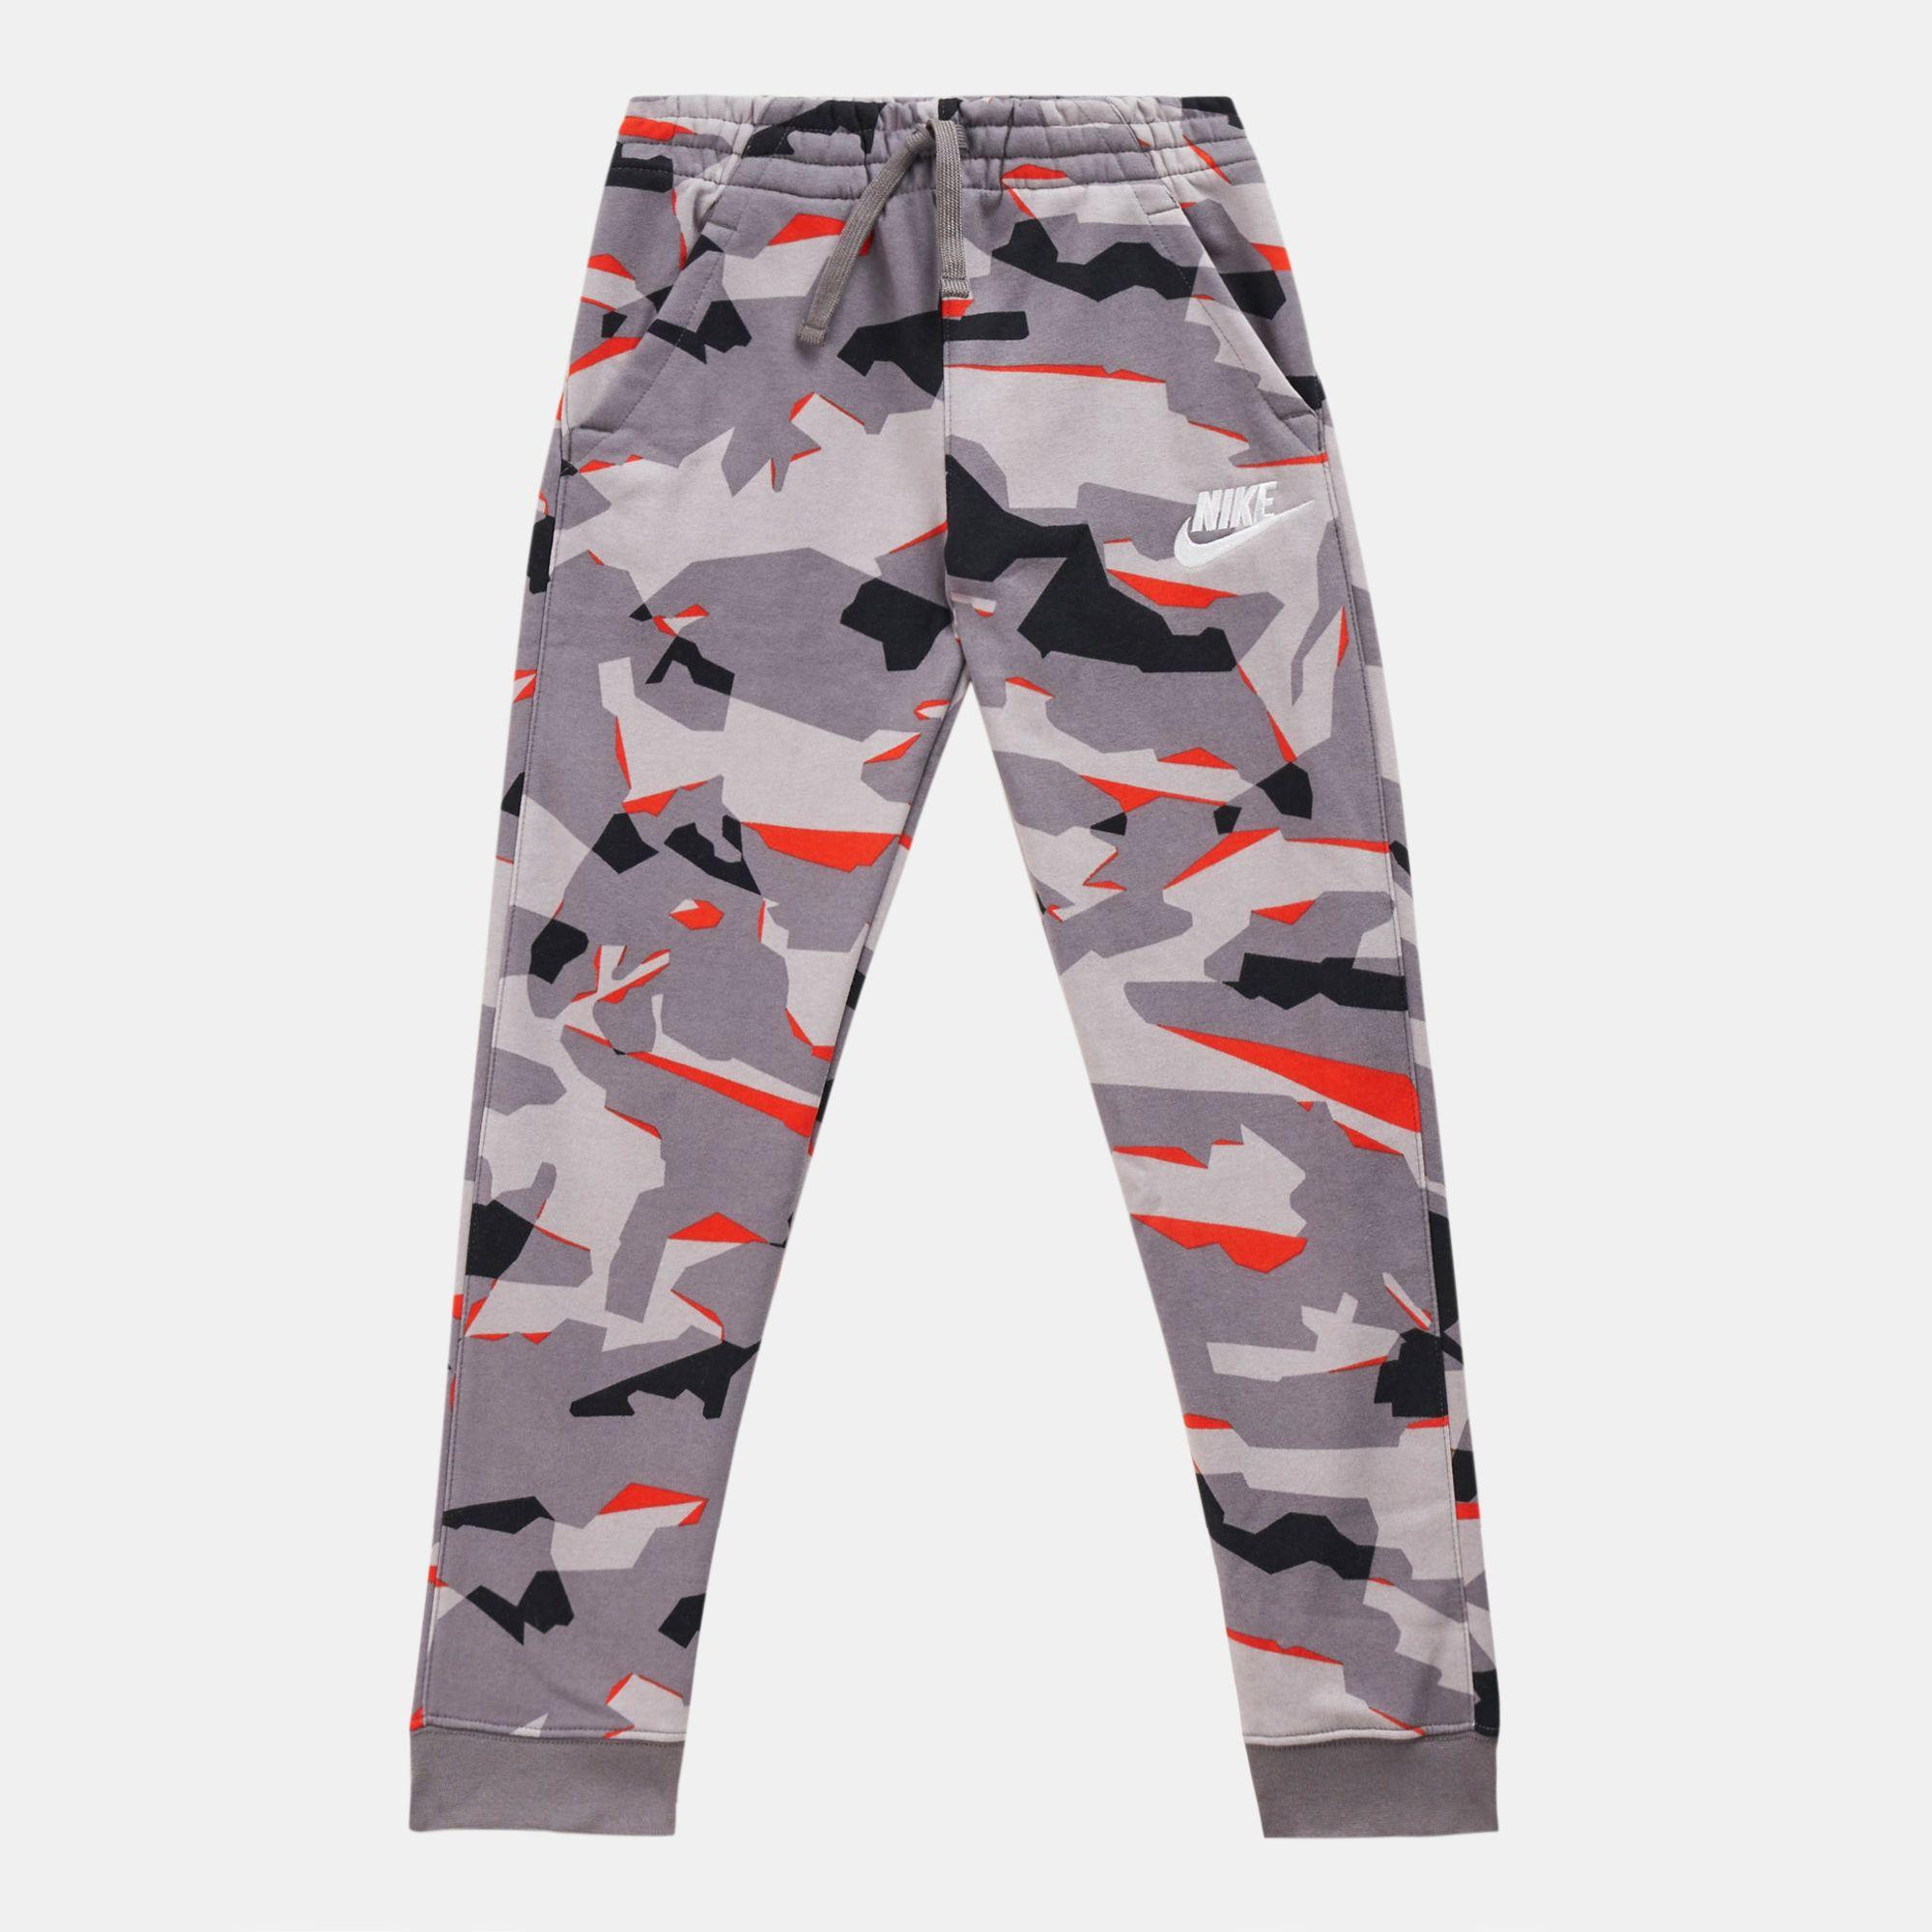 39e0b5654 Nike Kids' Sportswear Cam Joggers (Older Kids) | Pants | Clothing | Kids'  Sale | KSA Sale | SSS